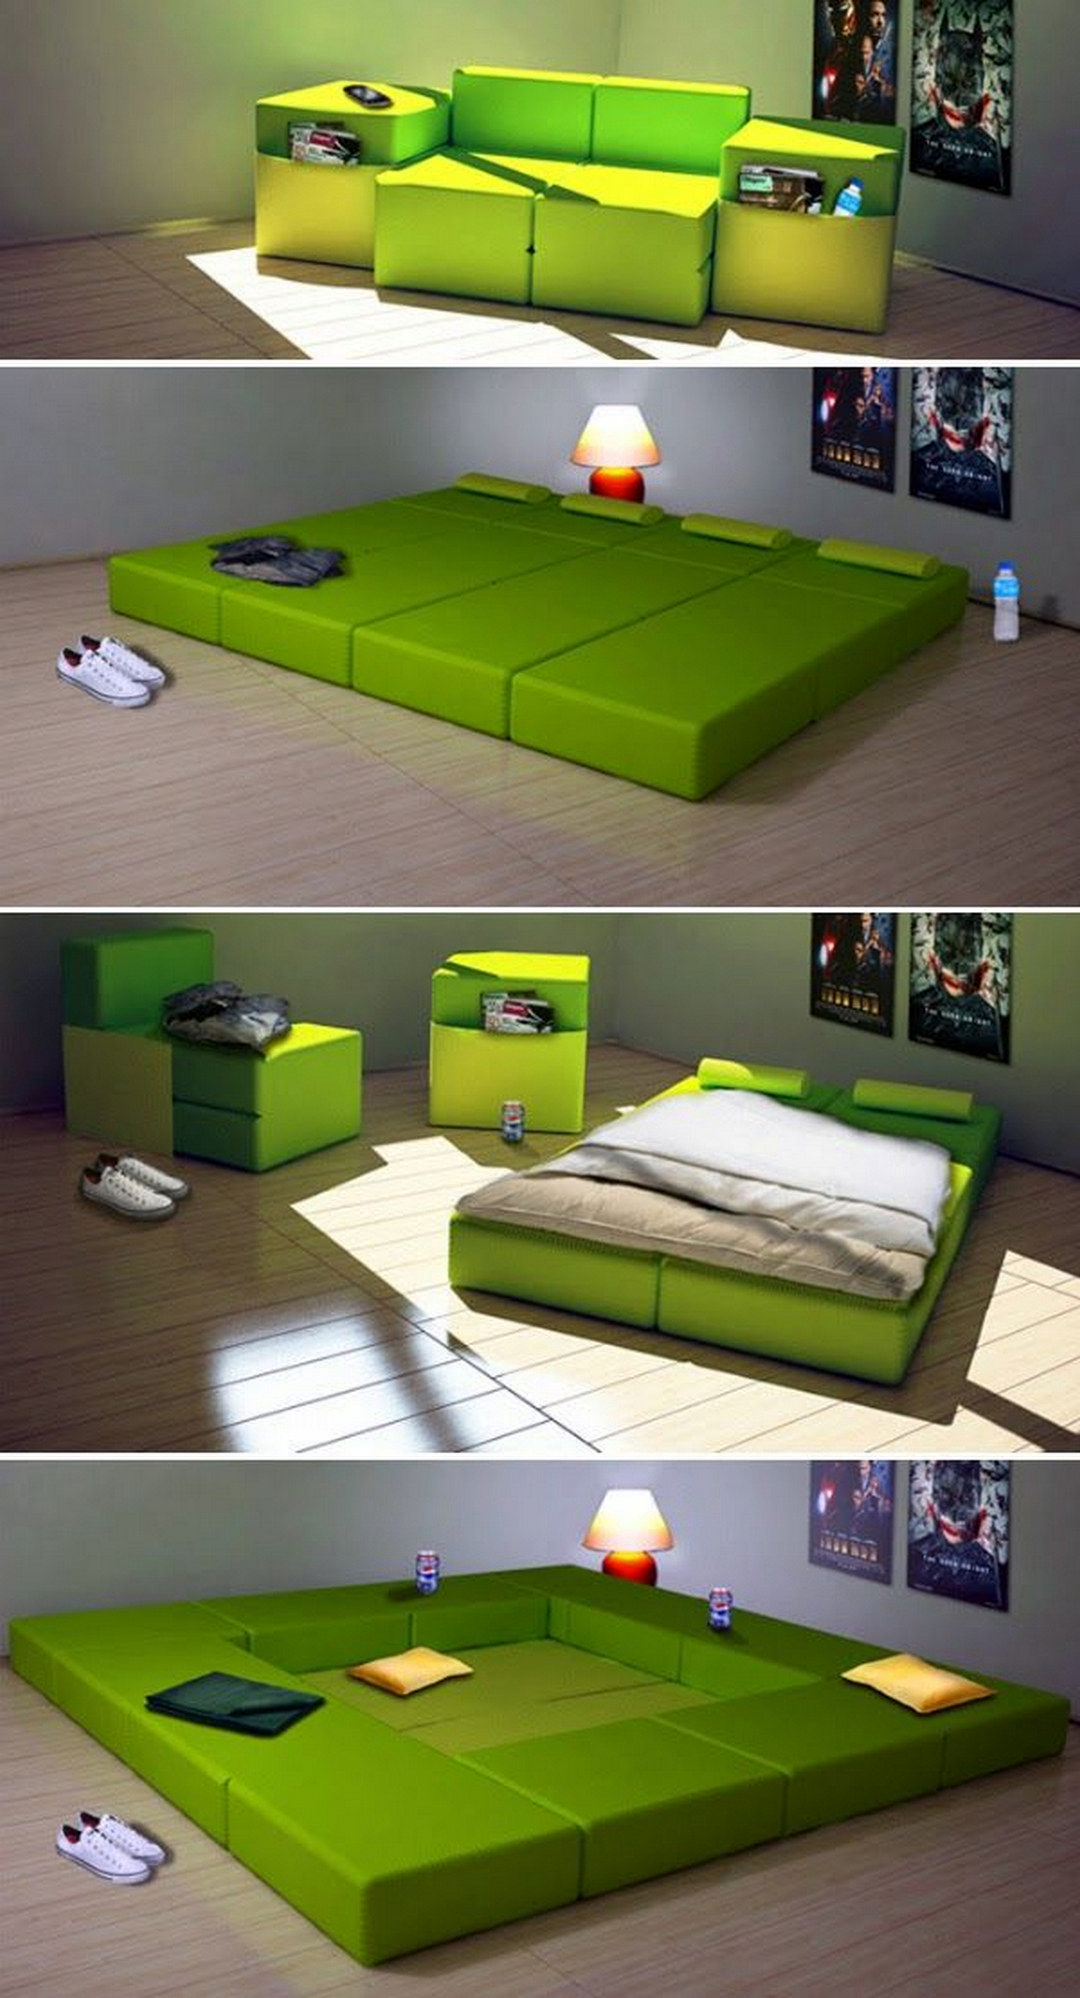 Creative Room Designs: Furniture For The National Audiovisual Institute (NInA): A